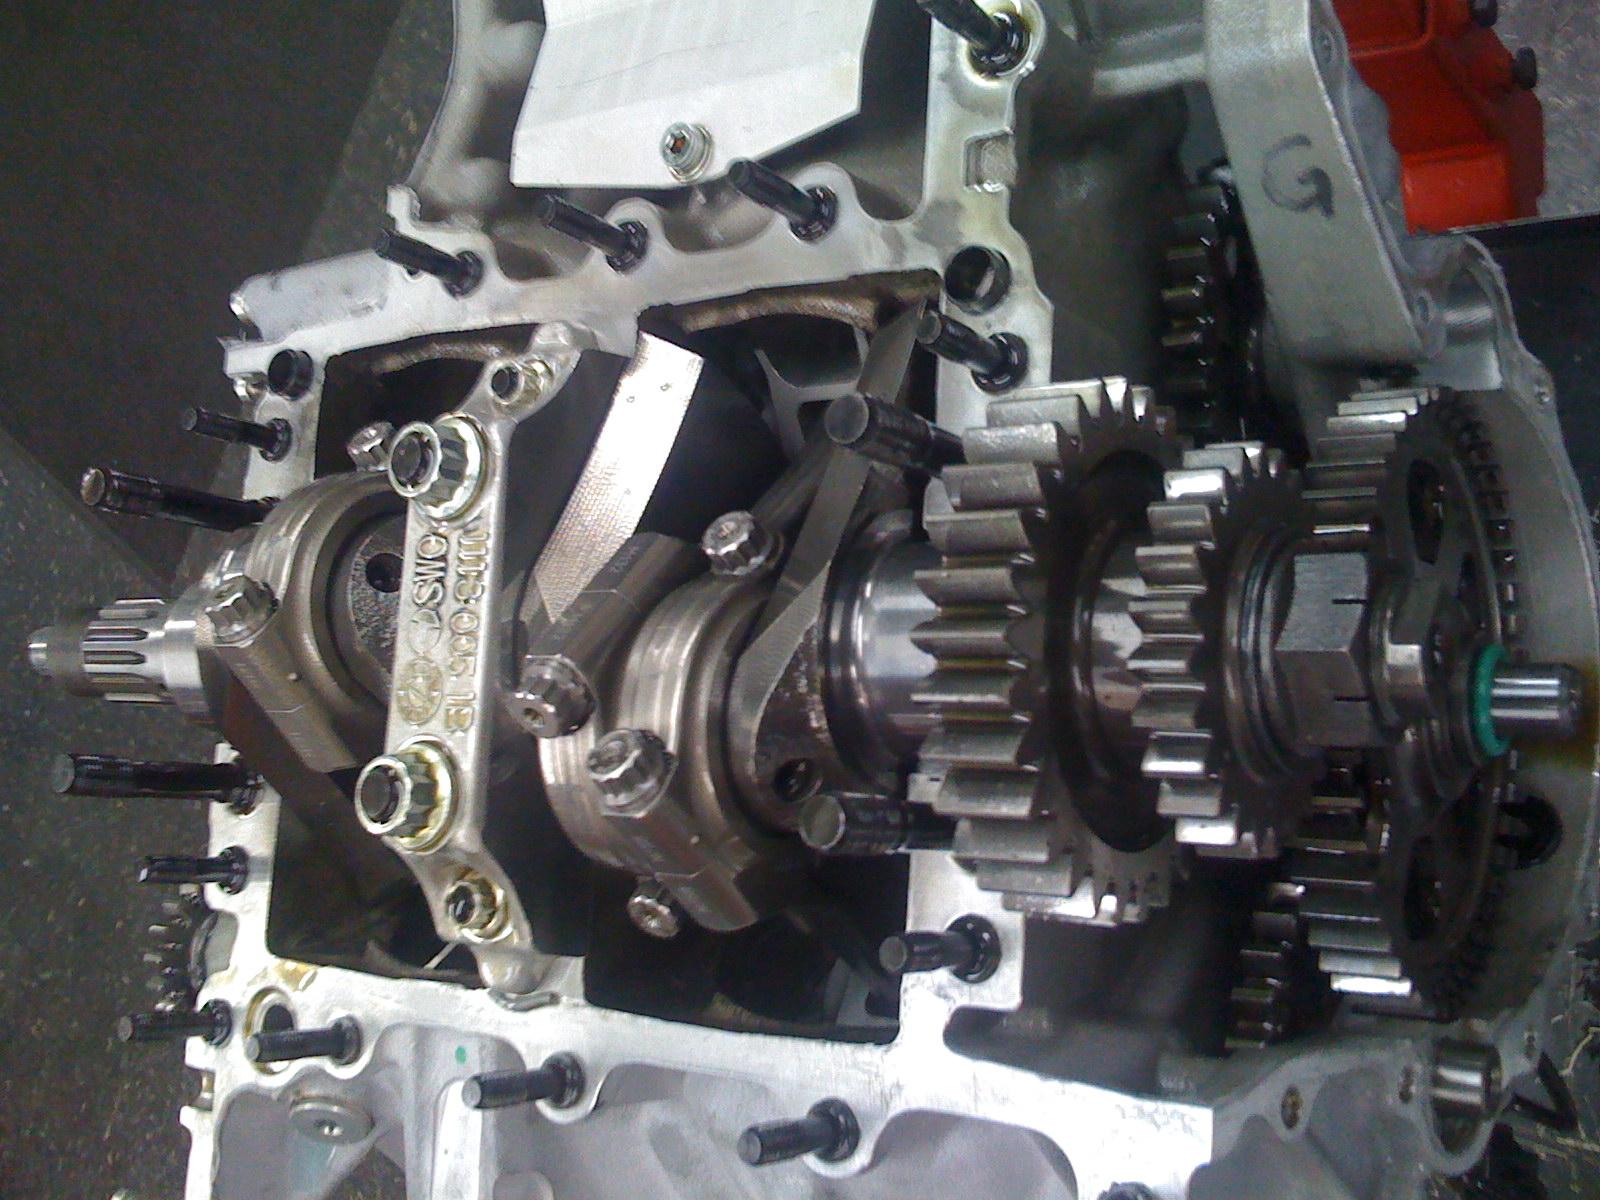 BMW Van Nuys >> Desmosedici open engine pictures. - Ducati.ms - The Ultimate Ducati Forum